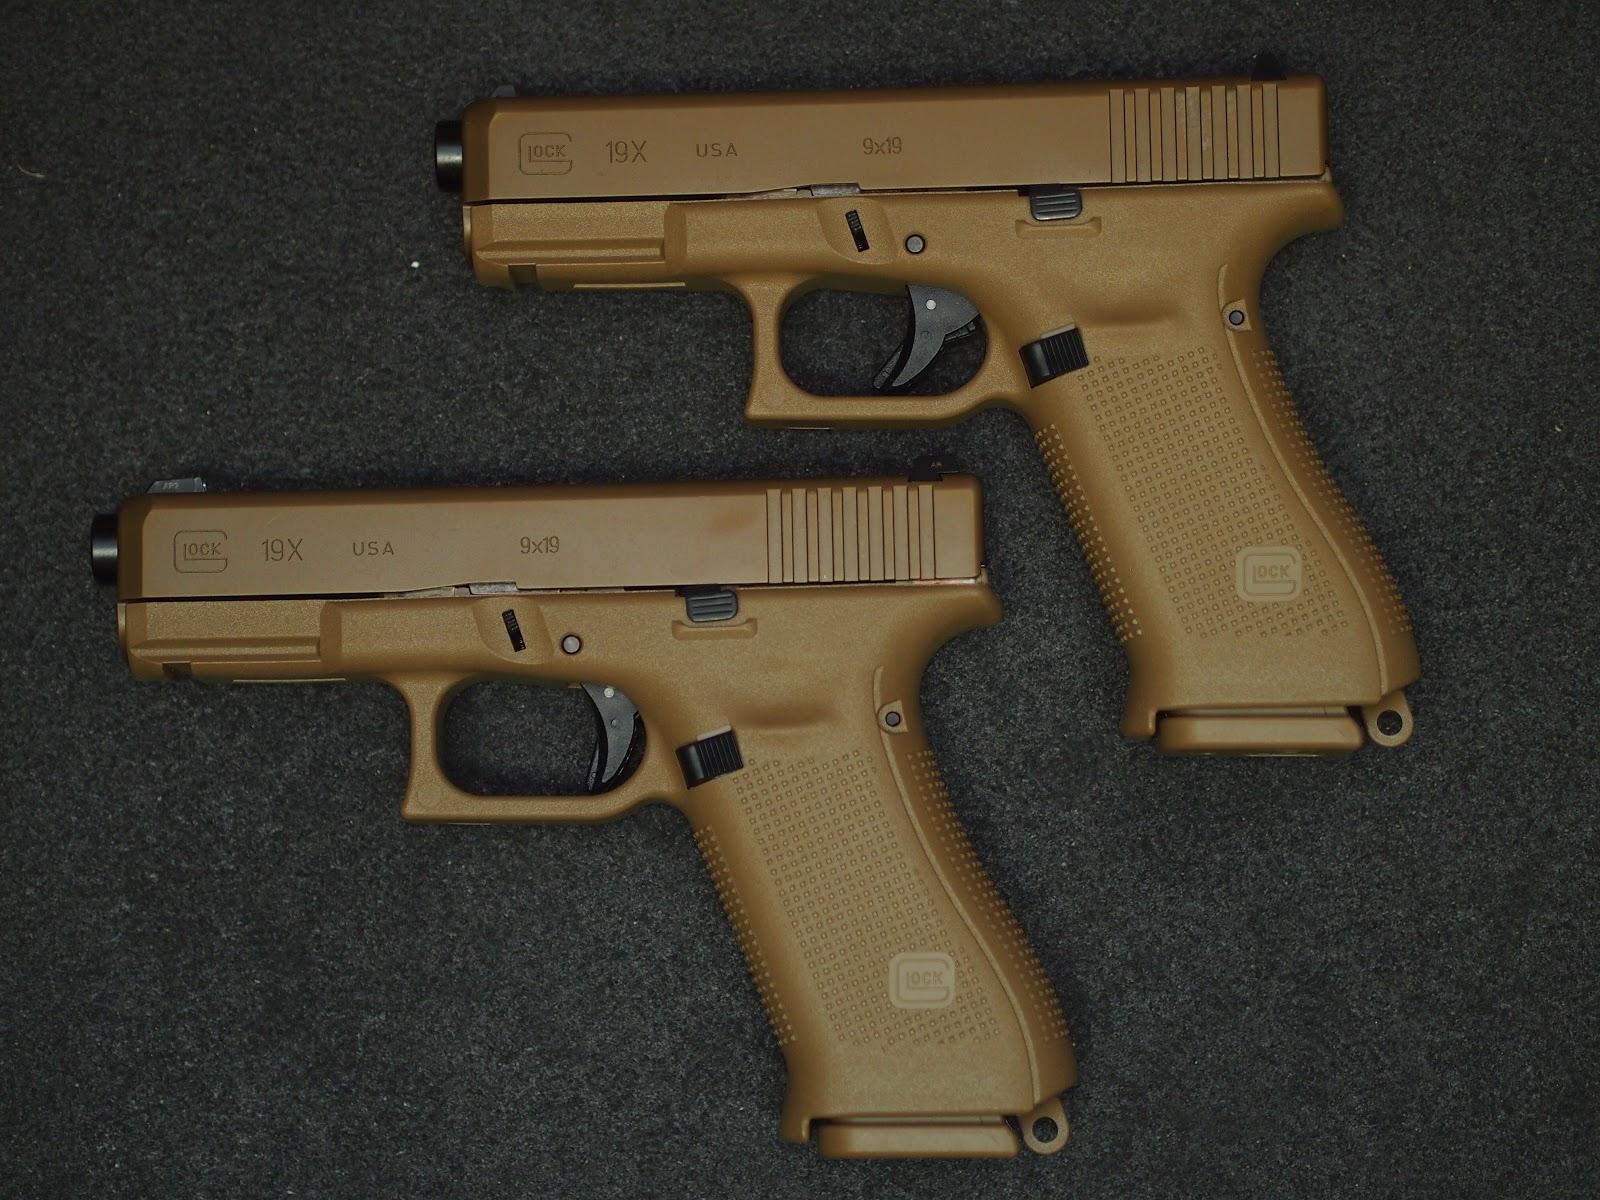 Mister Donut's Firearms Blog: Glock 19x Canadian version